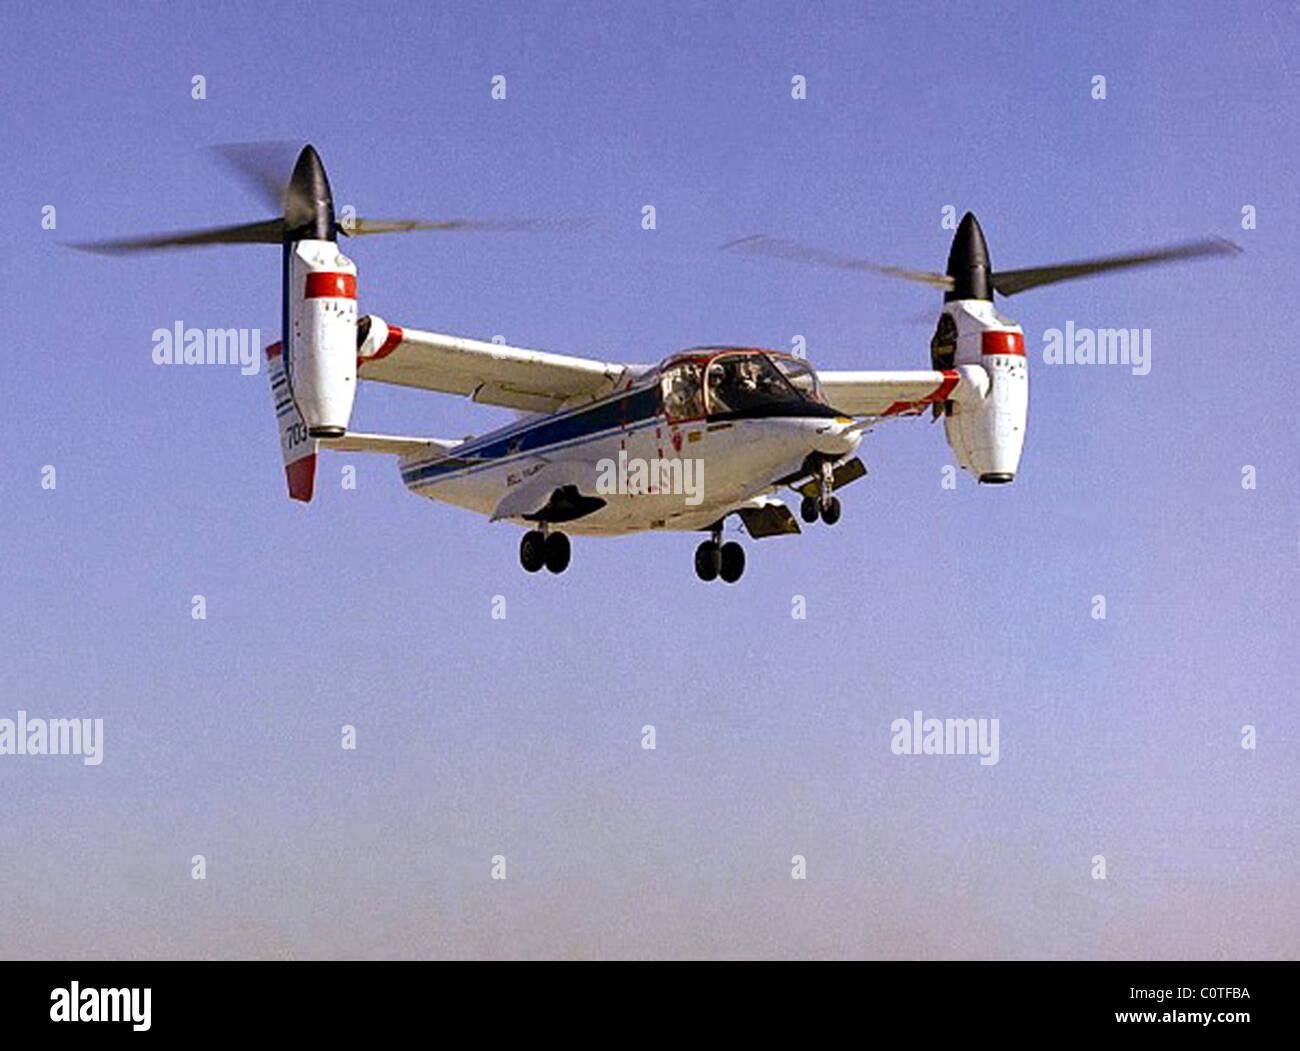 NASA-Army-Bell XV-15 tilt rotor research aircraft - Stock Image